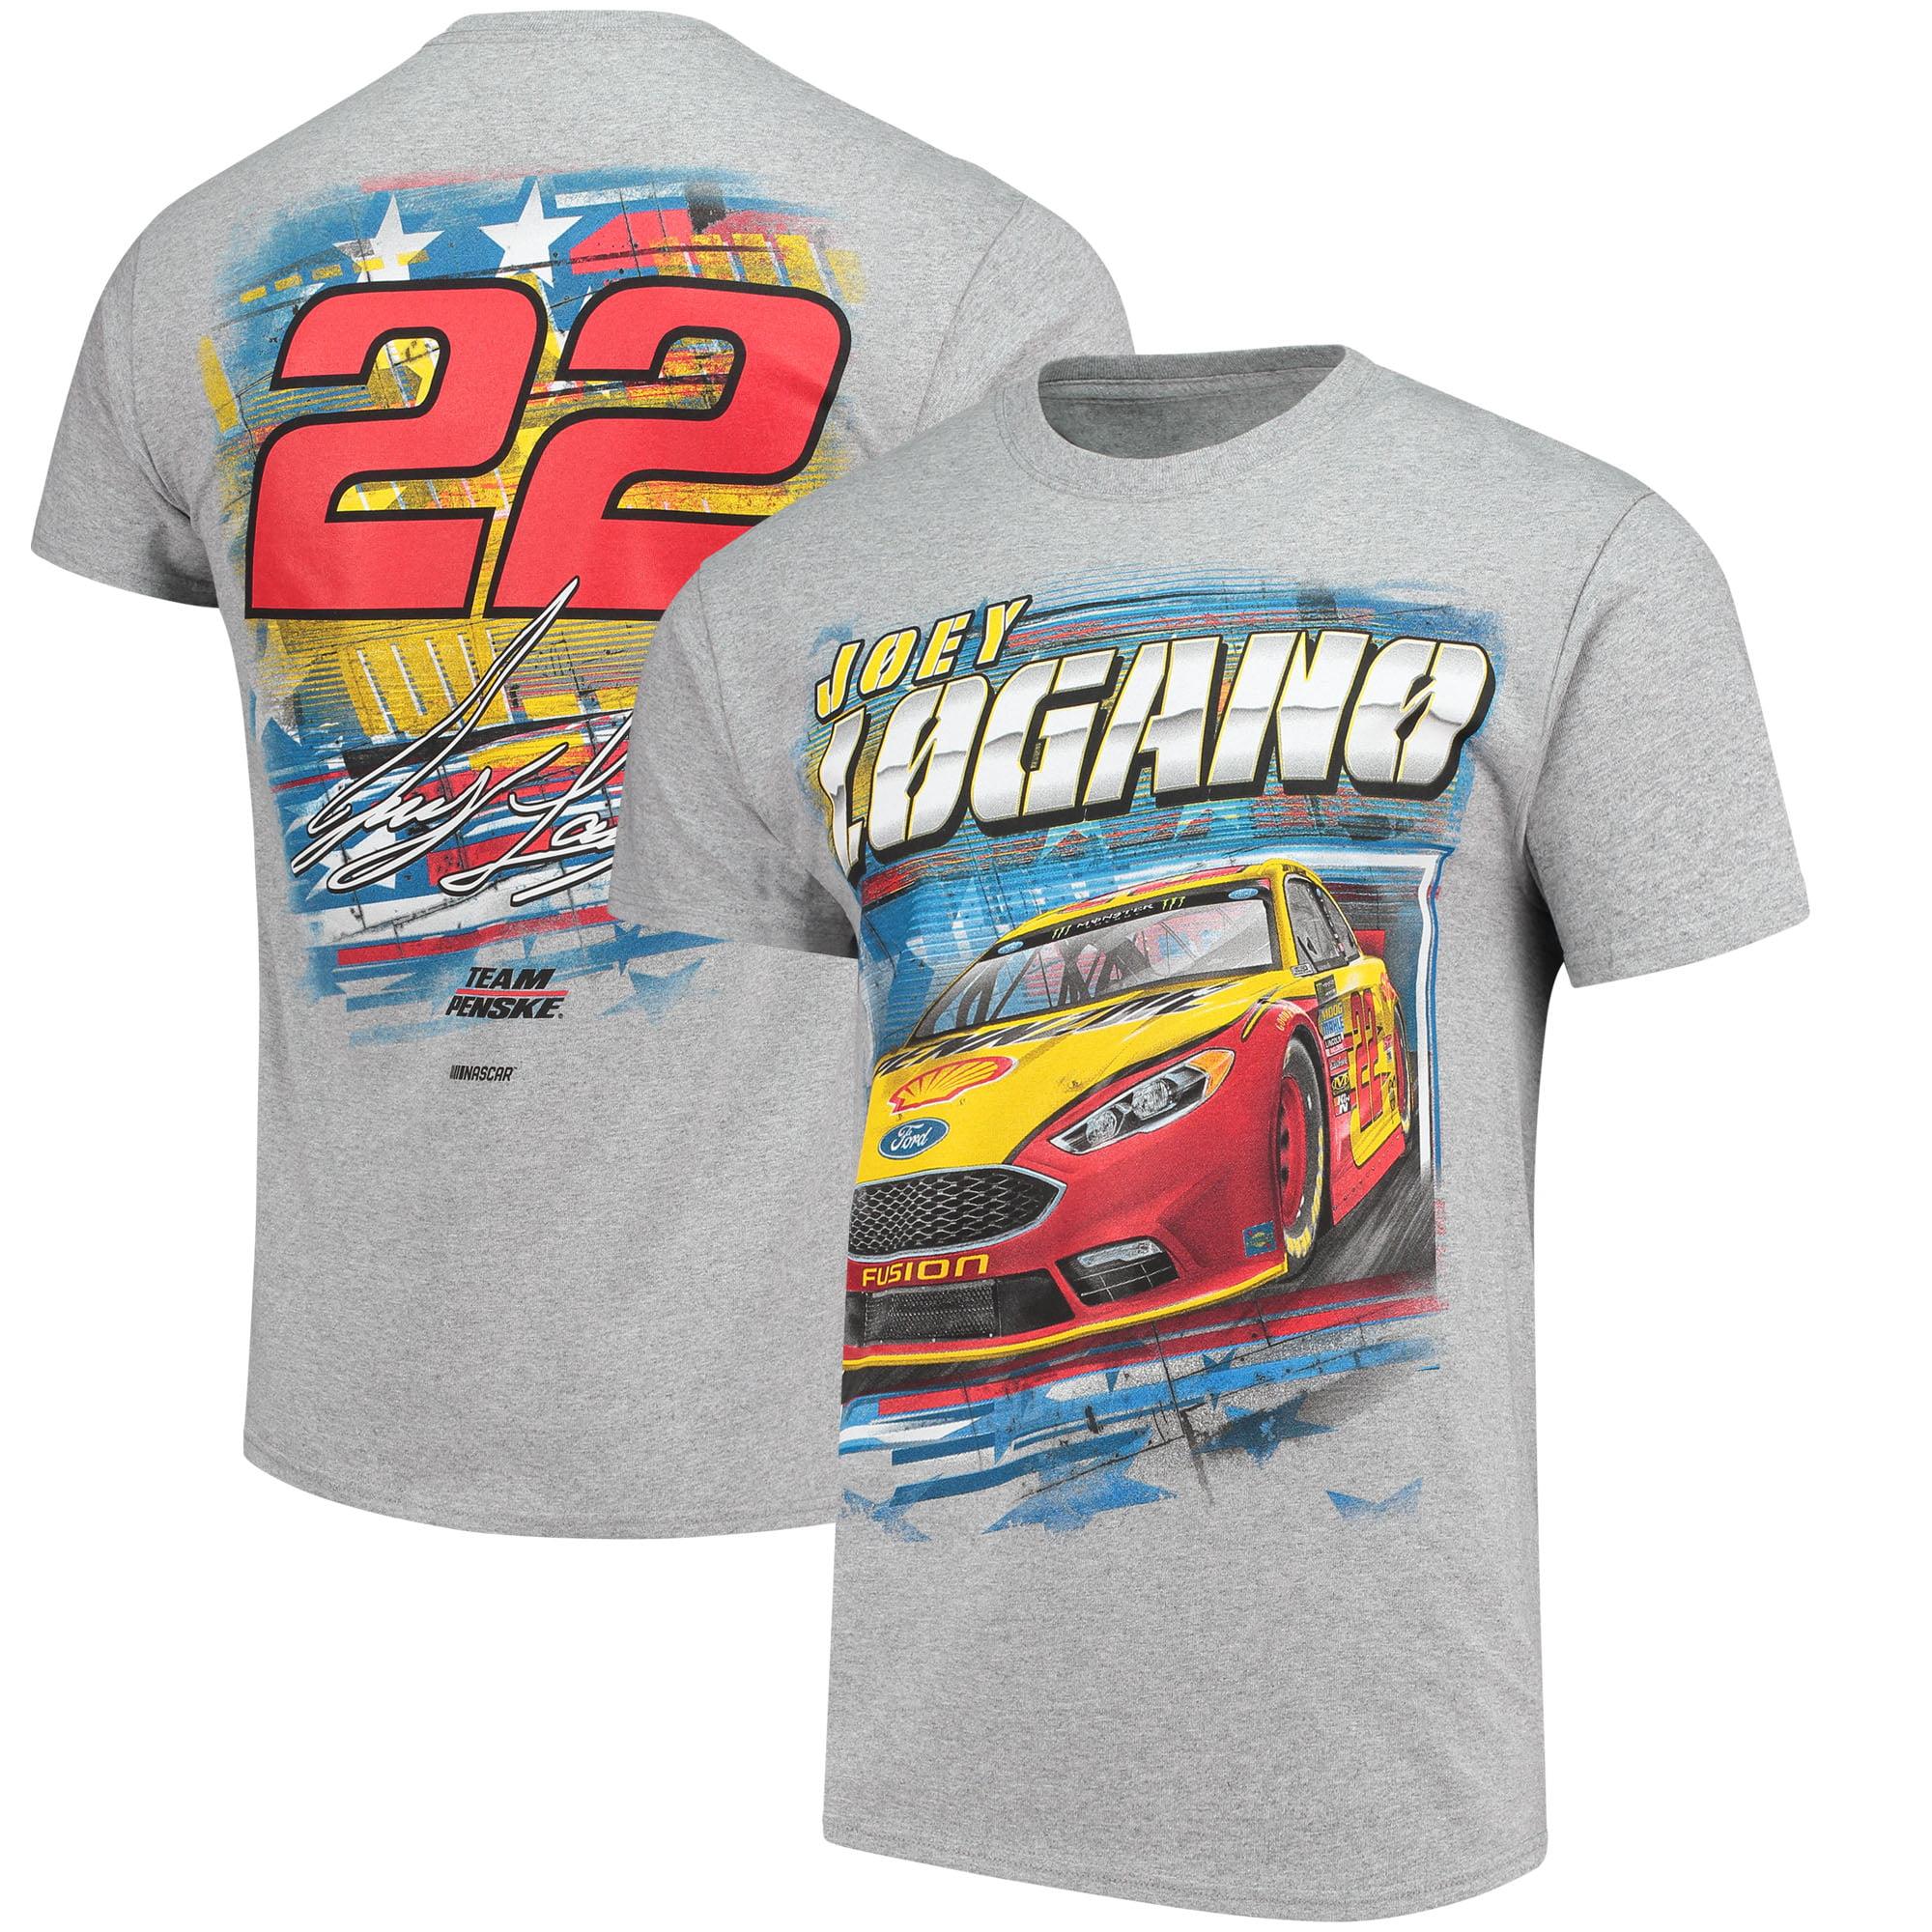 Joey Logano Checkered Flag Patriotic T-Shirt - Gray